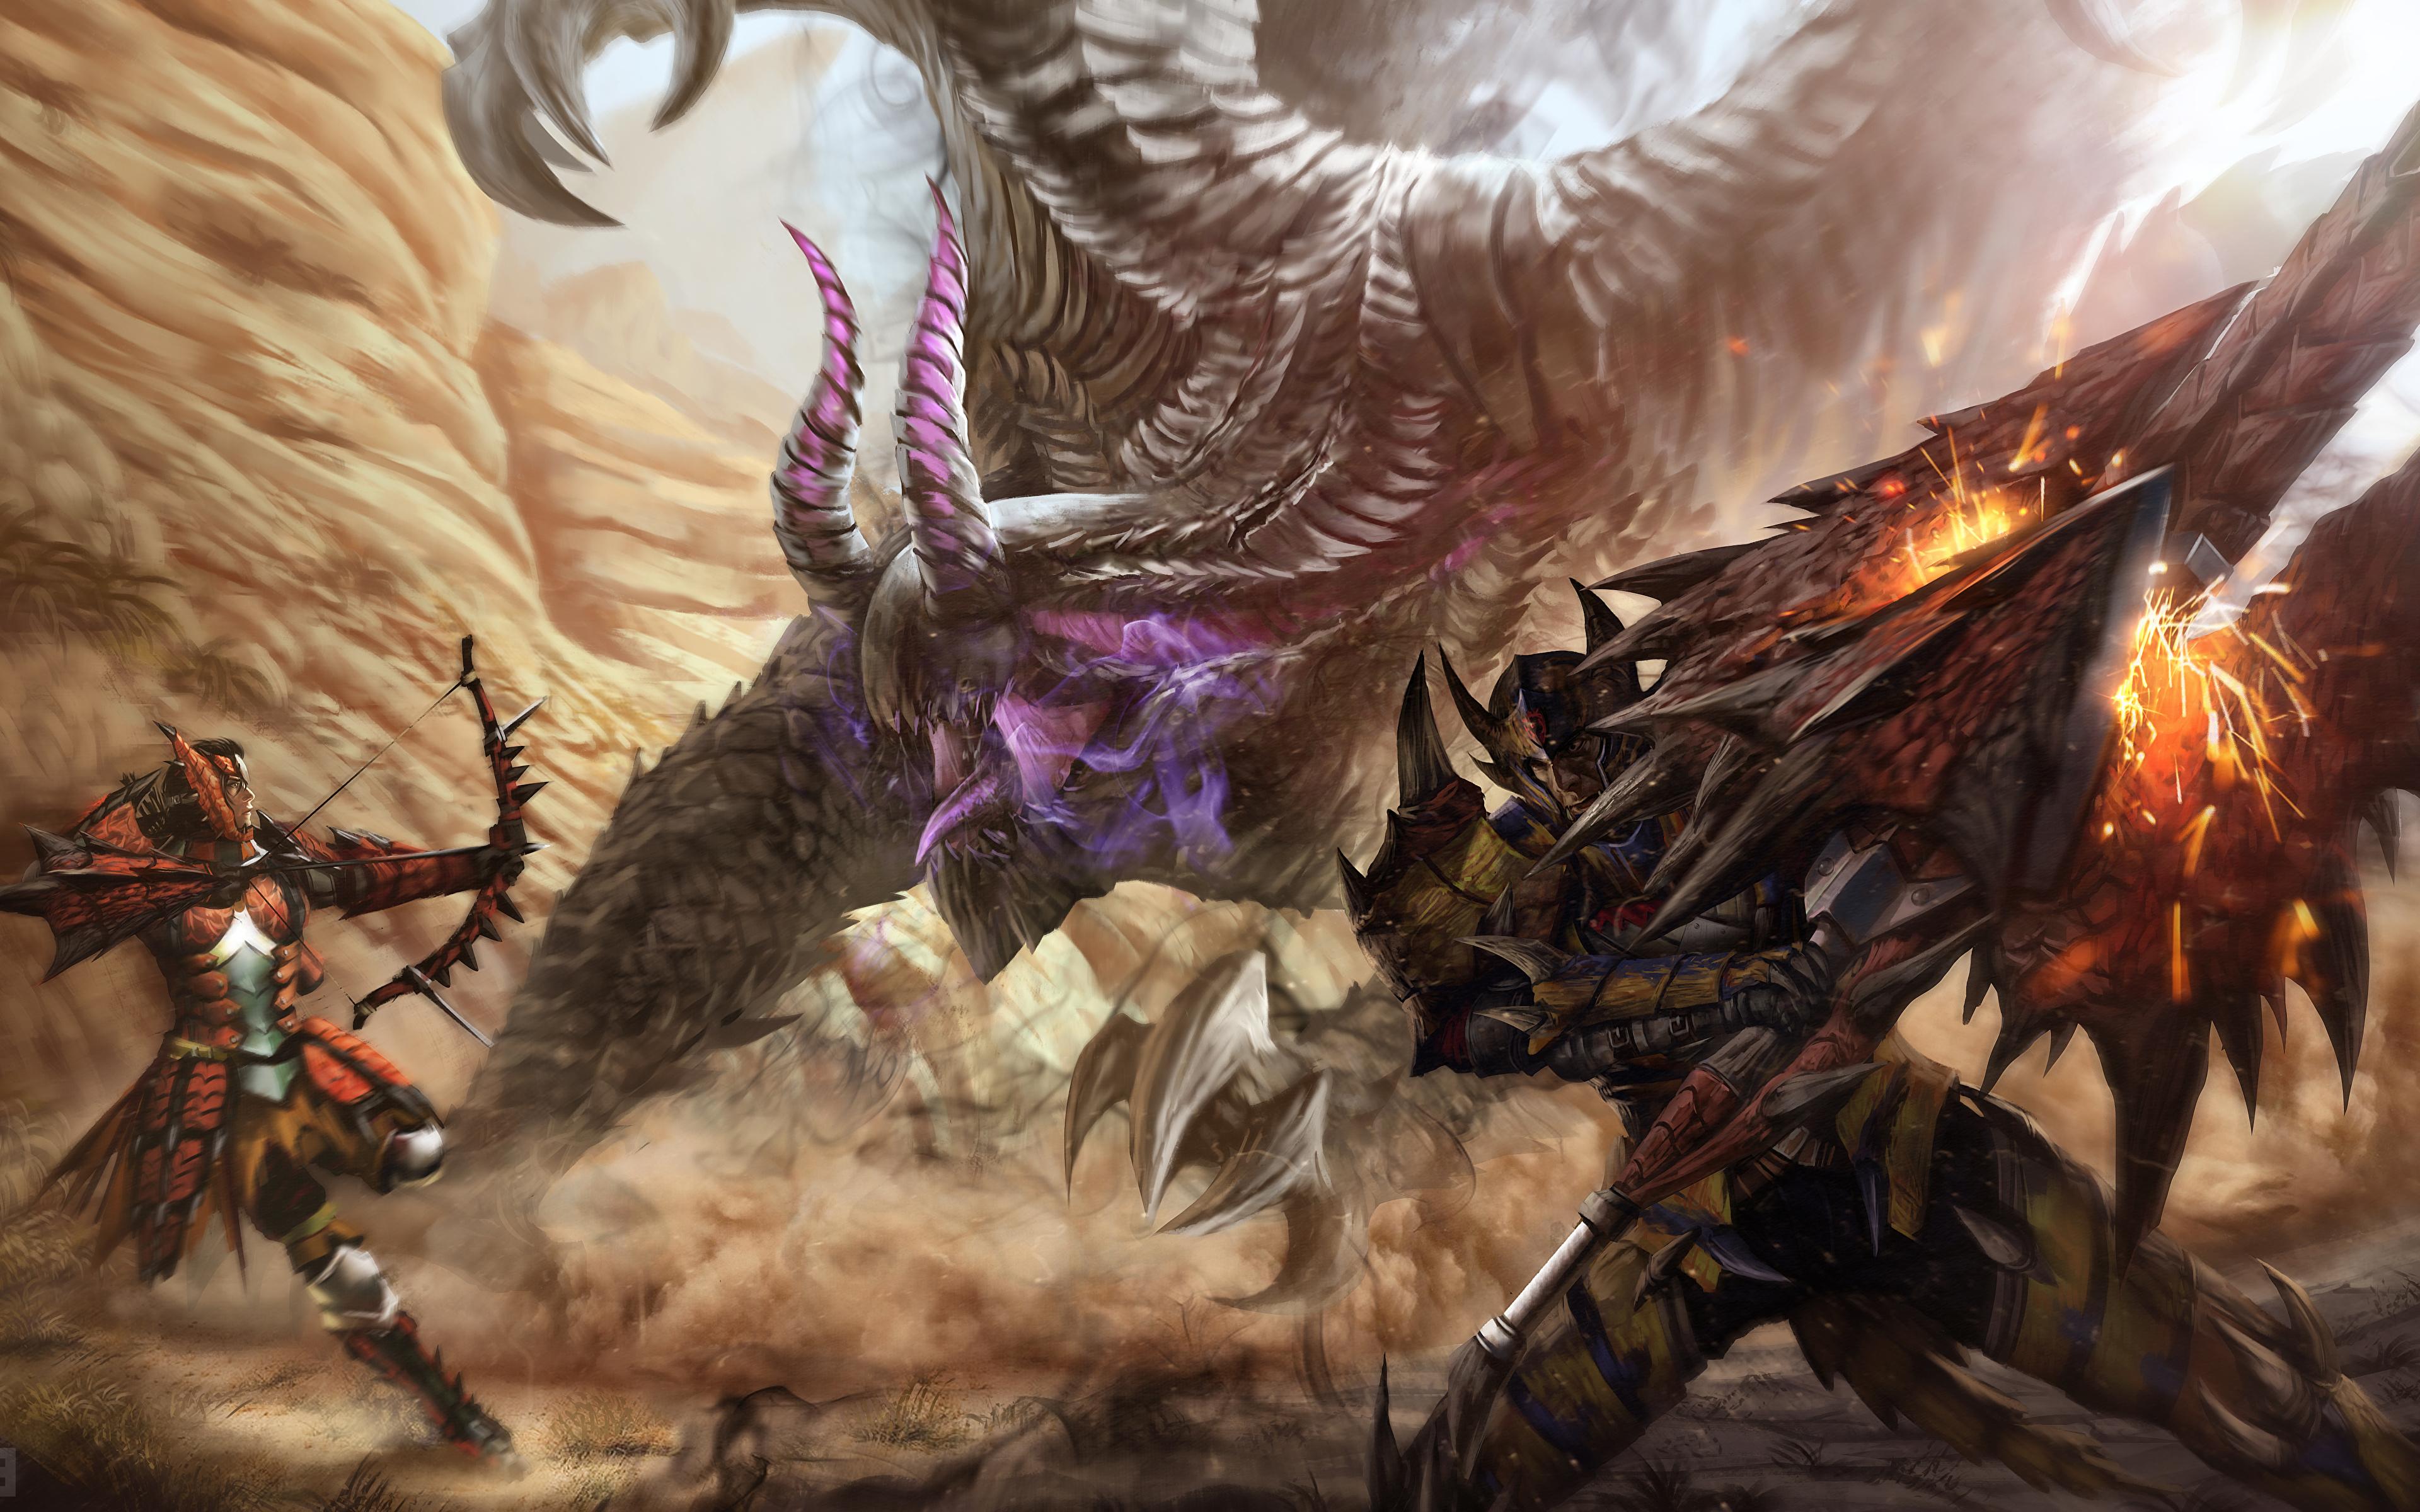 Battles_Dragons_Archers_445021_3840x2400.jpg - Monster Hunter: World